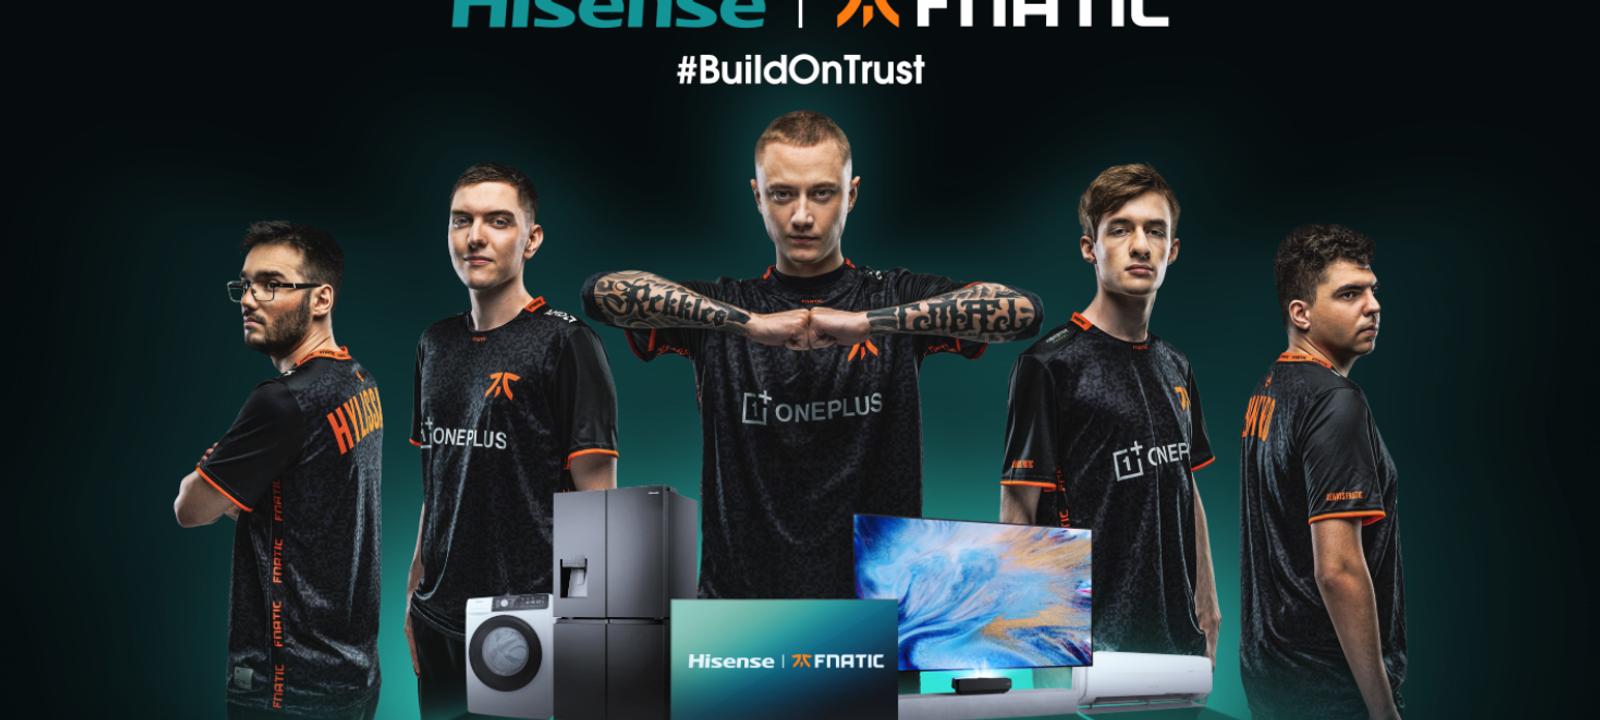 Fnatic Announces Global Partnership With Hisense